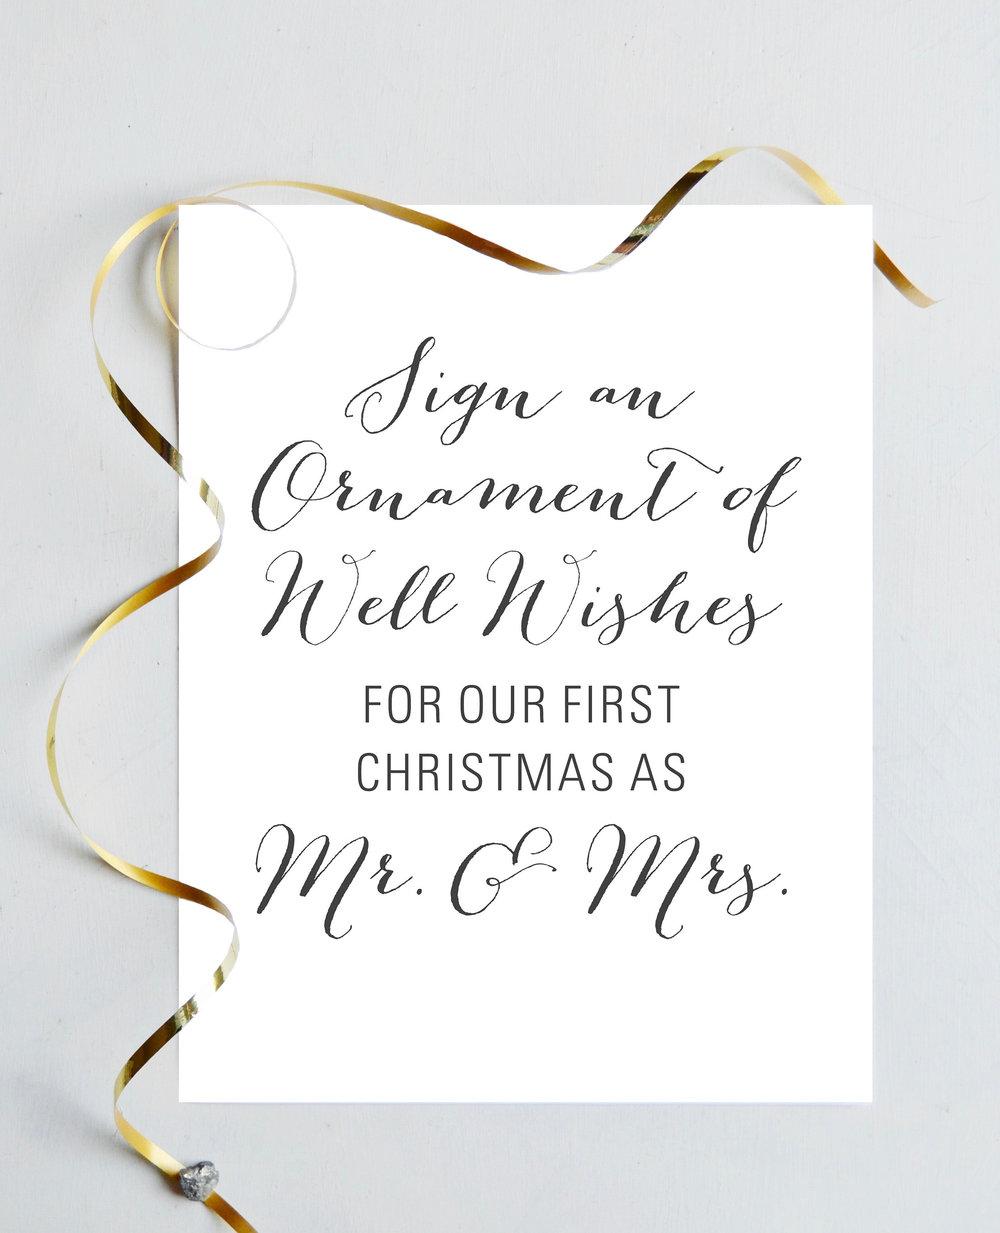 ornament wedding guest book.jpg